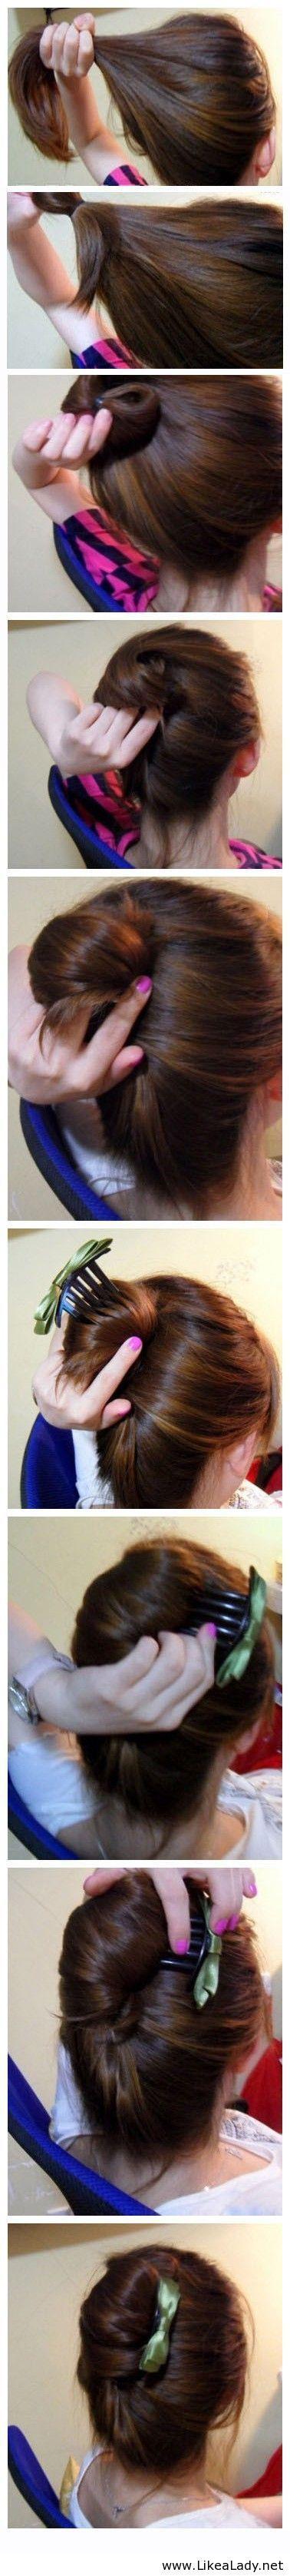 Beautiful hairstyle tutorial with a cute hair accessory 바카라카지노 바카라카지노 바카라카지노 바카라카지노 바카라카지노 바카라카지노 바카라카지노 바카라카지노 바카라카지노 바카라카지노 바카라카지노